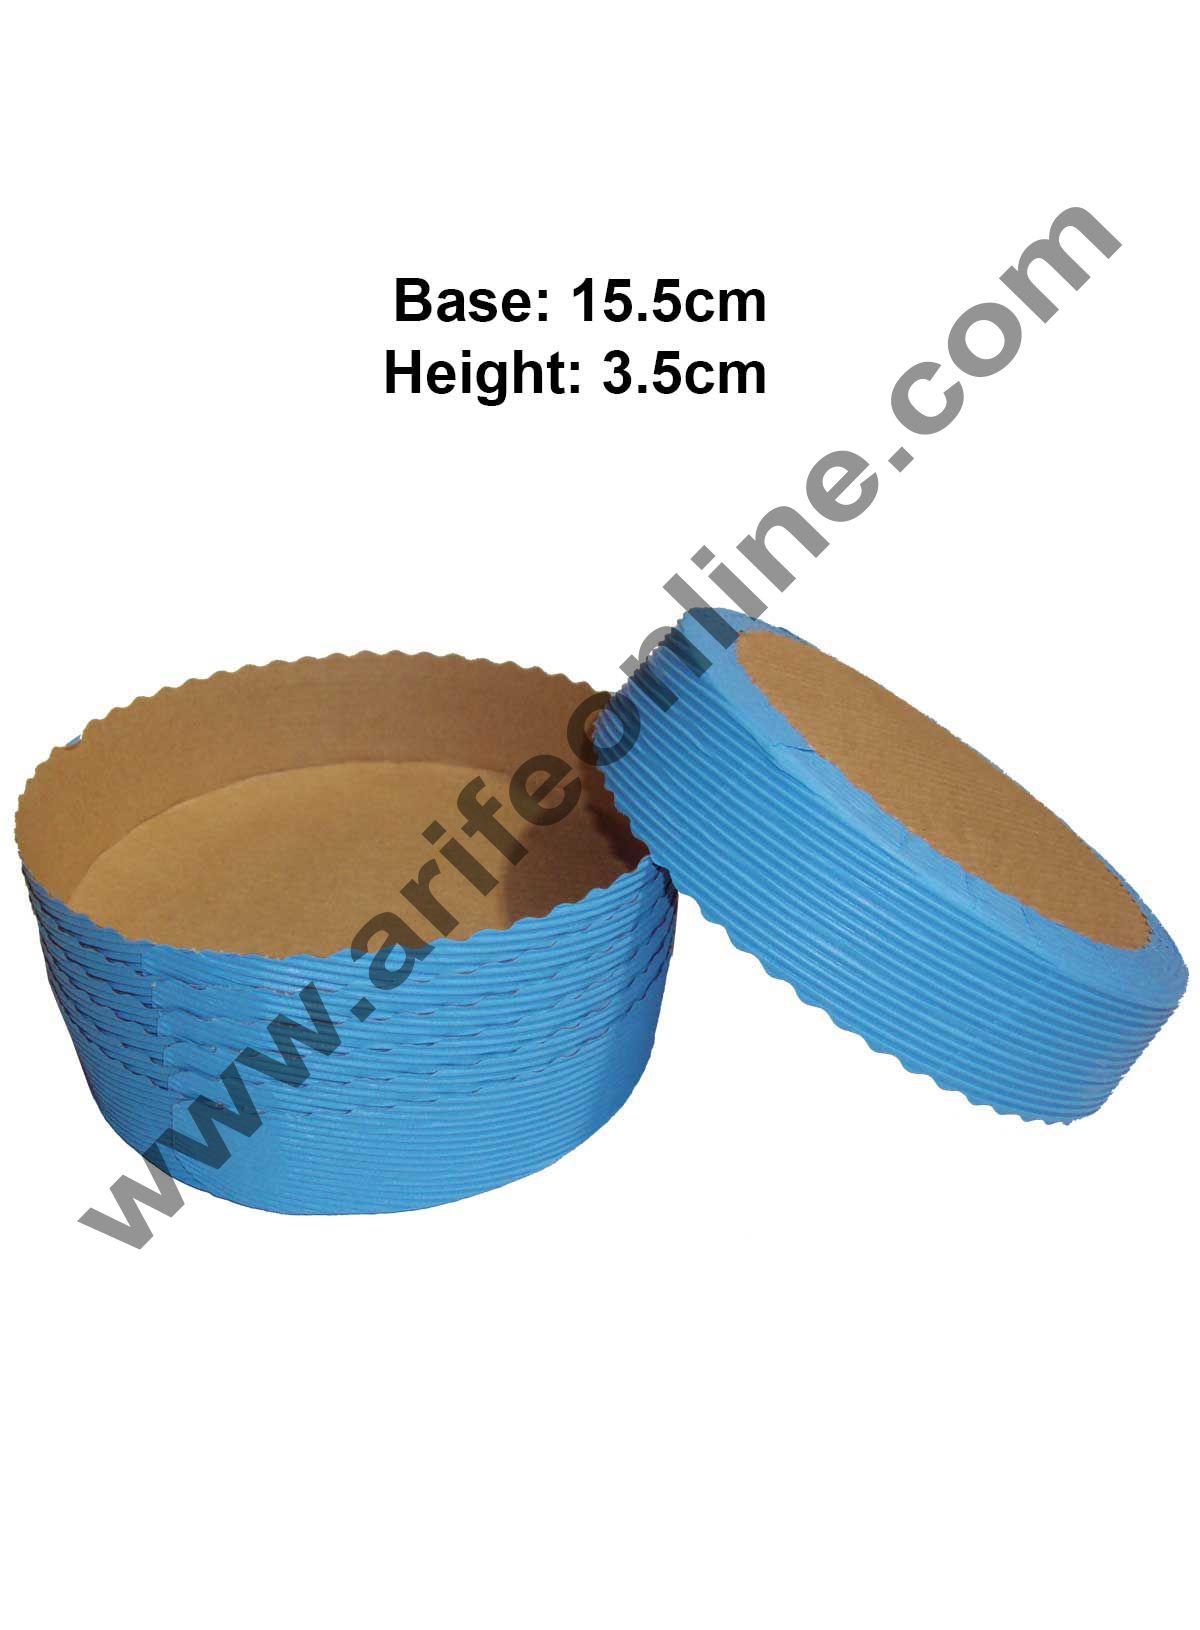 Novacart Bake & Serve Paper Baking Mould By Cake Decor - Round Cake Mould Blue 10 Pcs